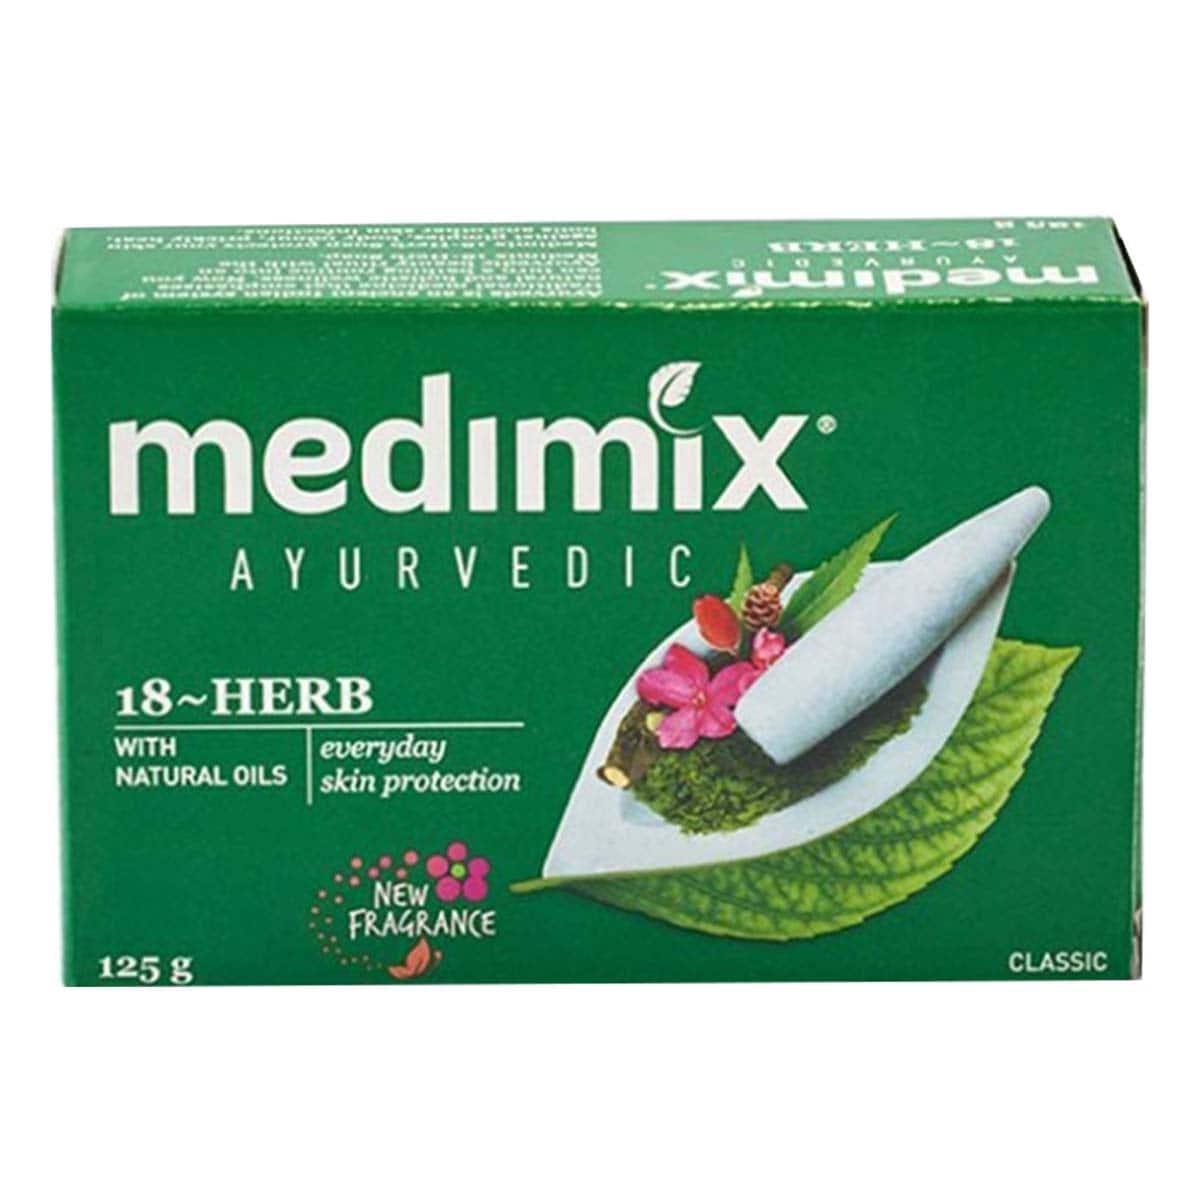 Buy Medimix Ayurvedic Classic Soap with 18 Herbs - 125 gm